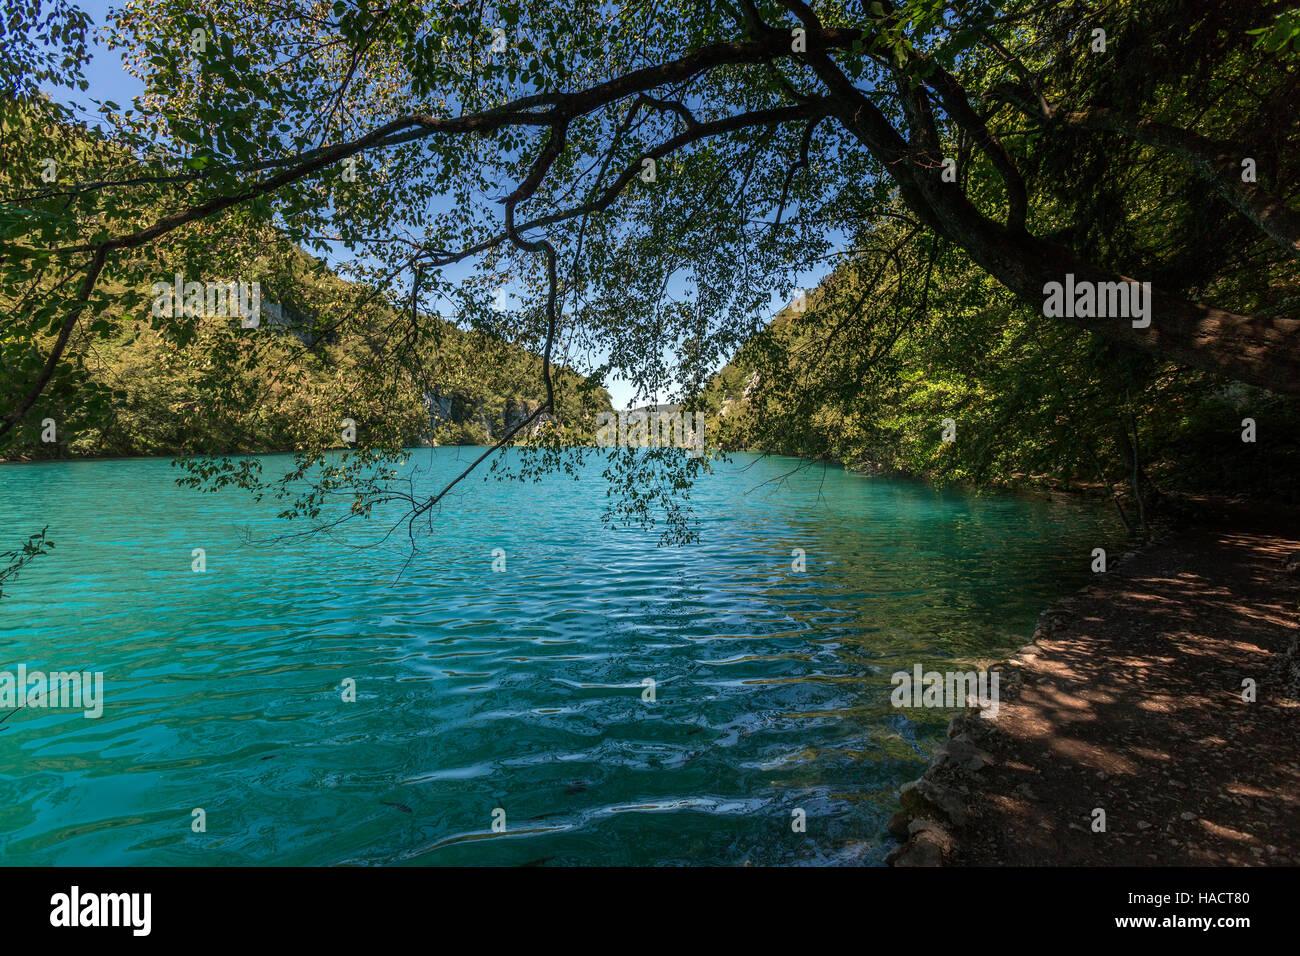 Plitvice Lakes National Park in Croatia - Stock Image